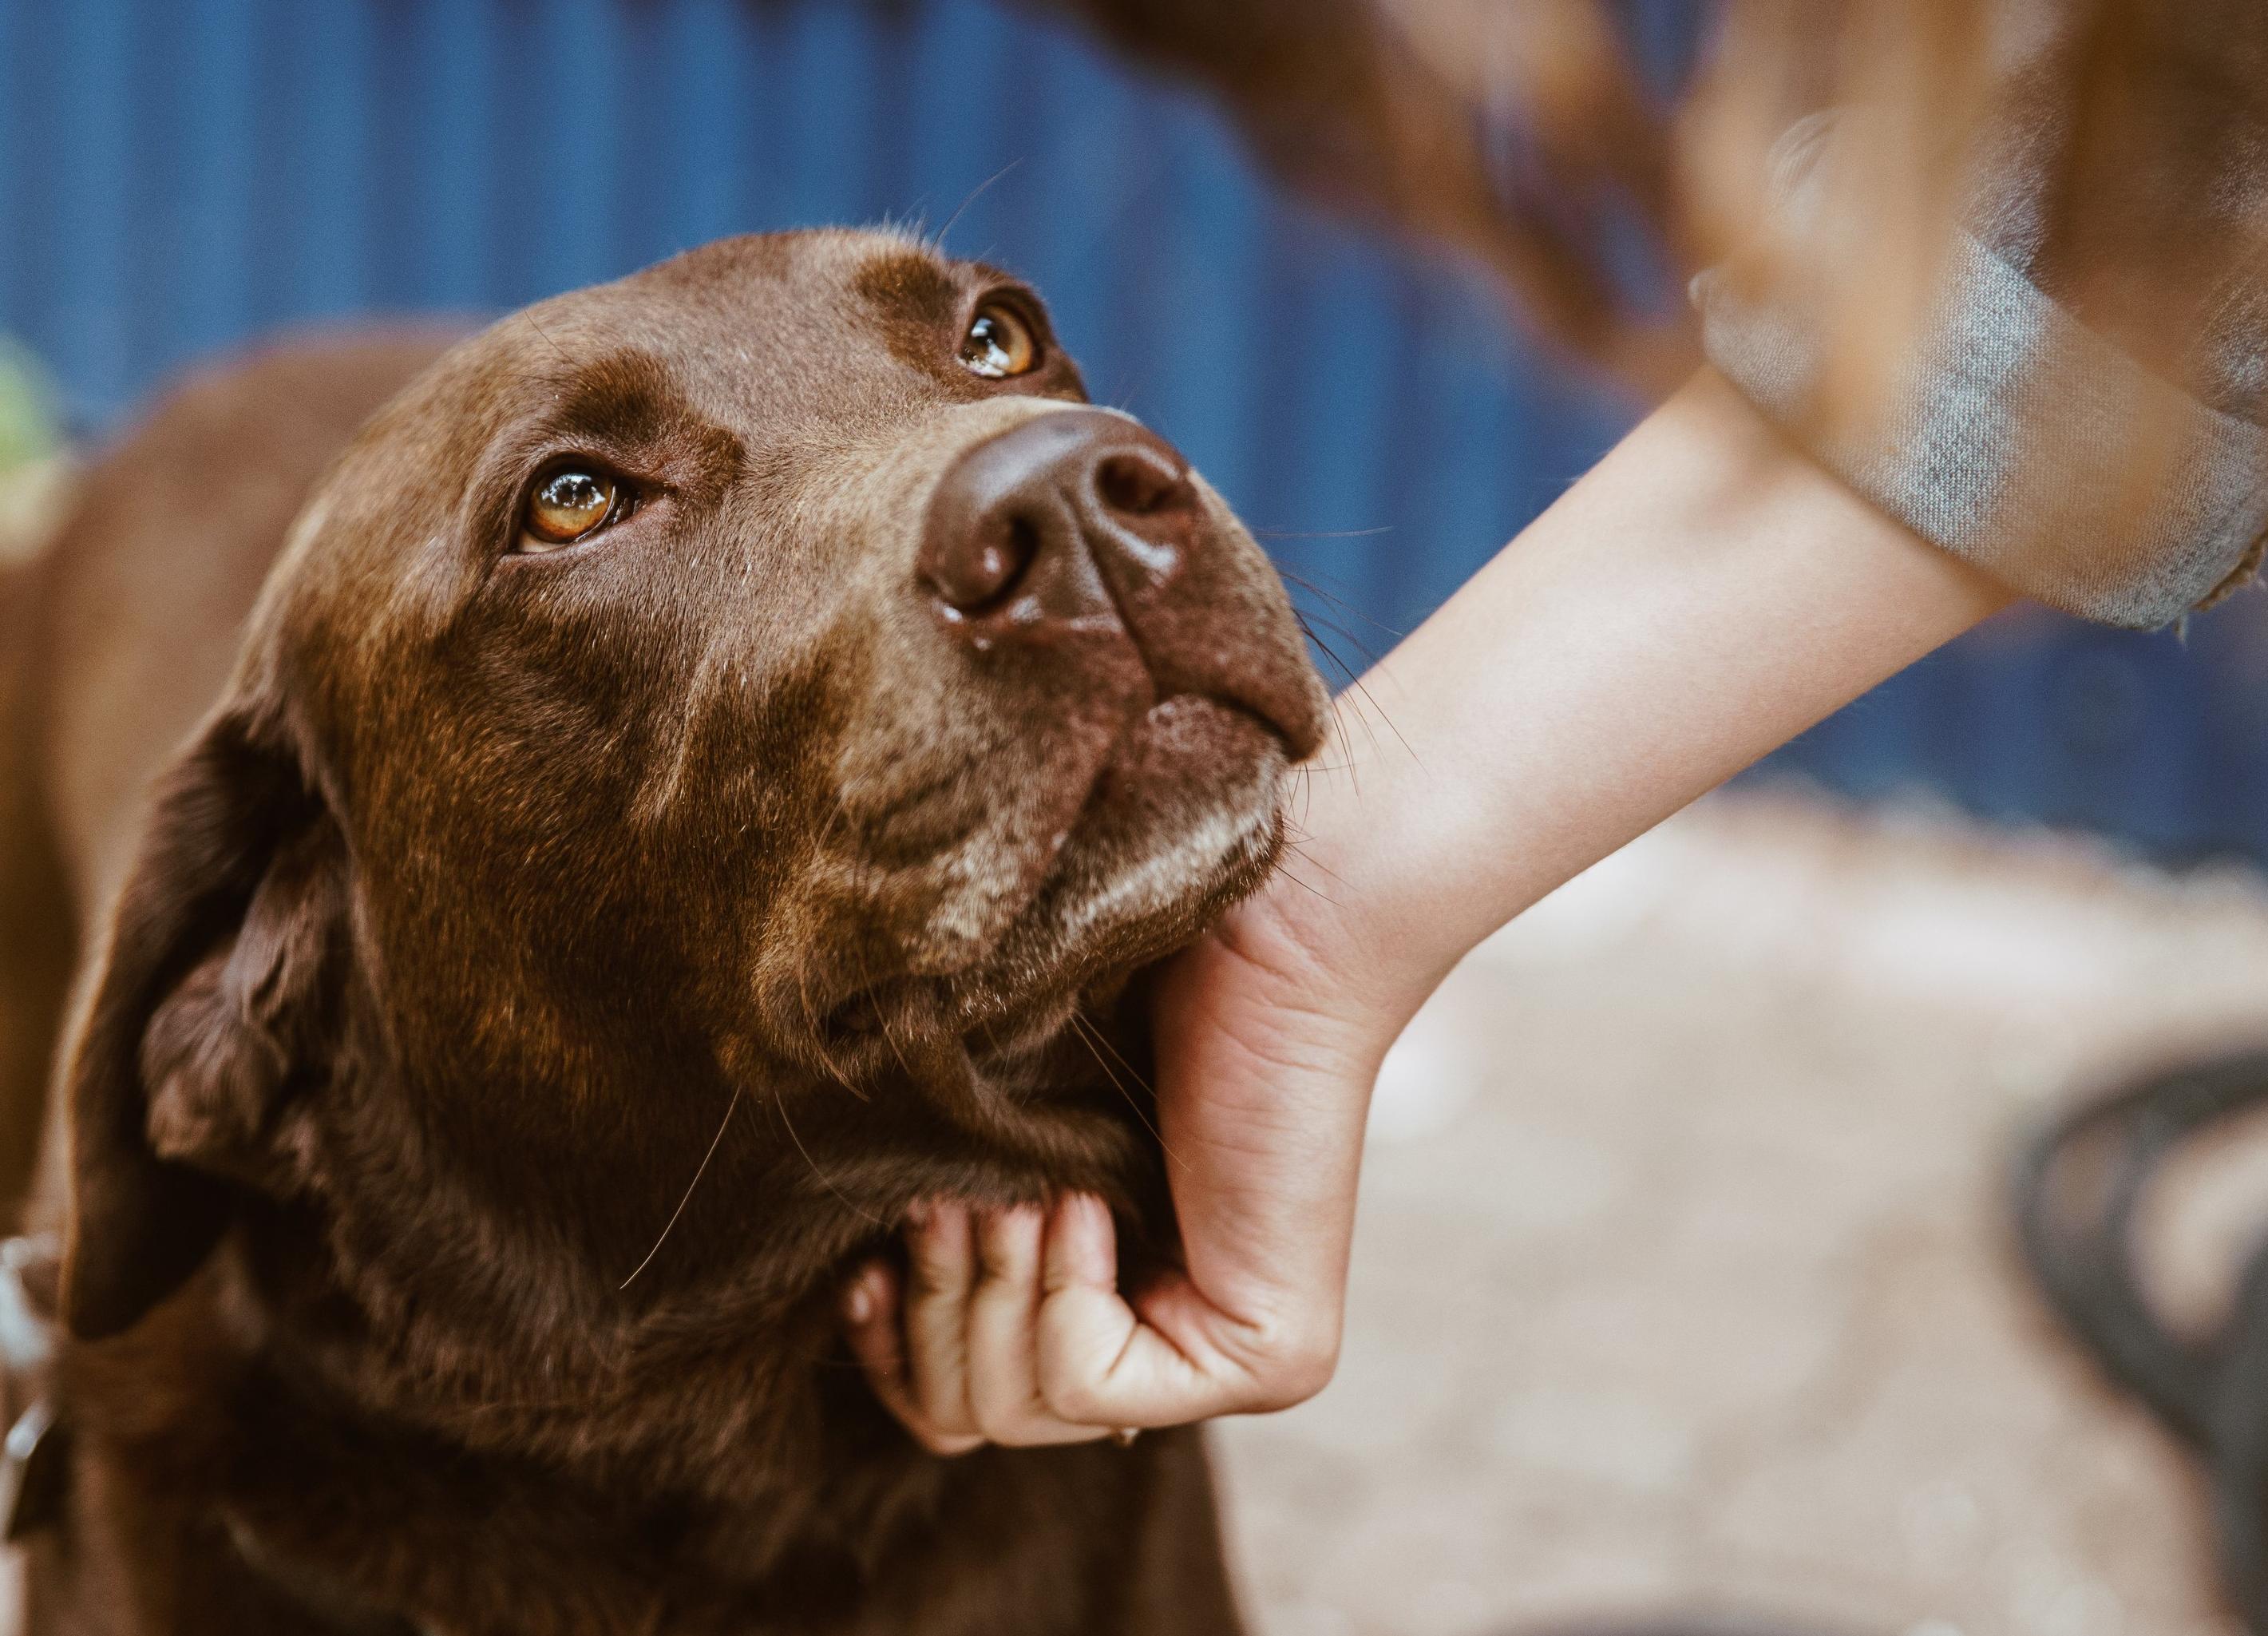 médecine vétérinaire intuitive énergétique soin humain animal communication animale énergétique communication animale